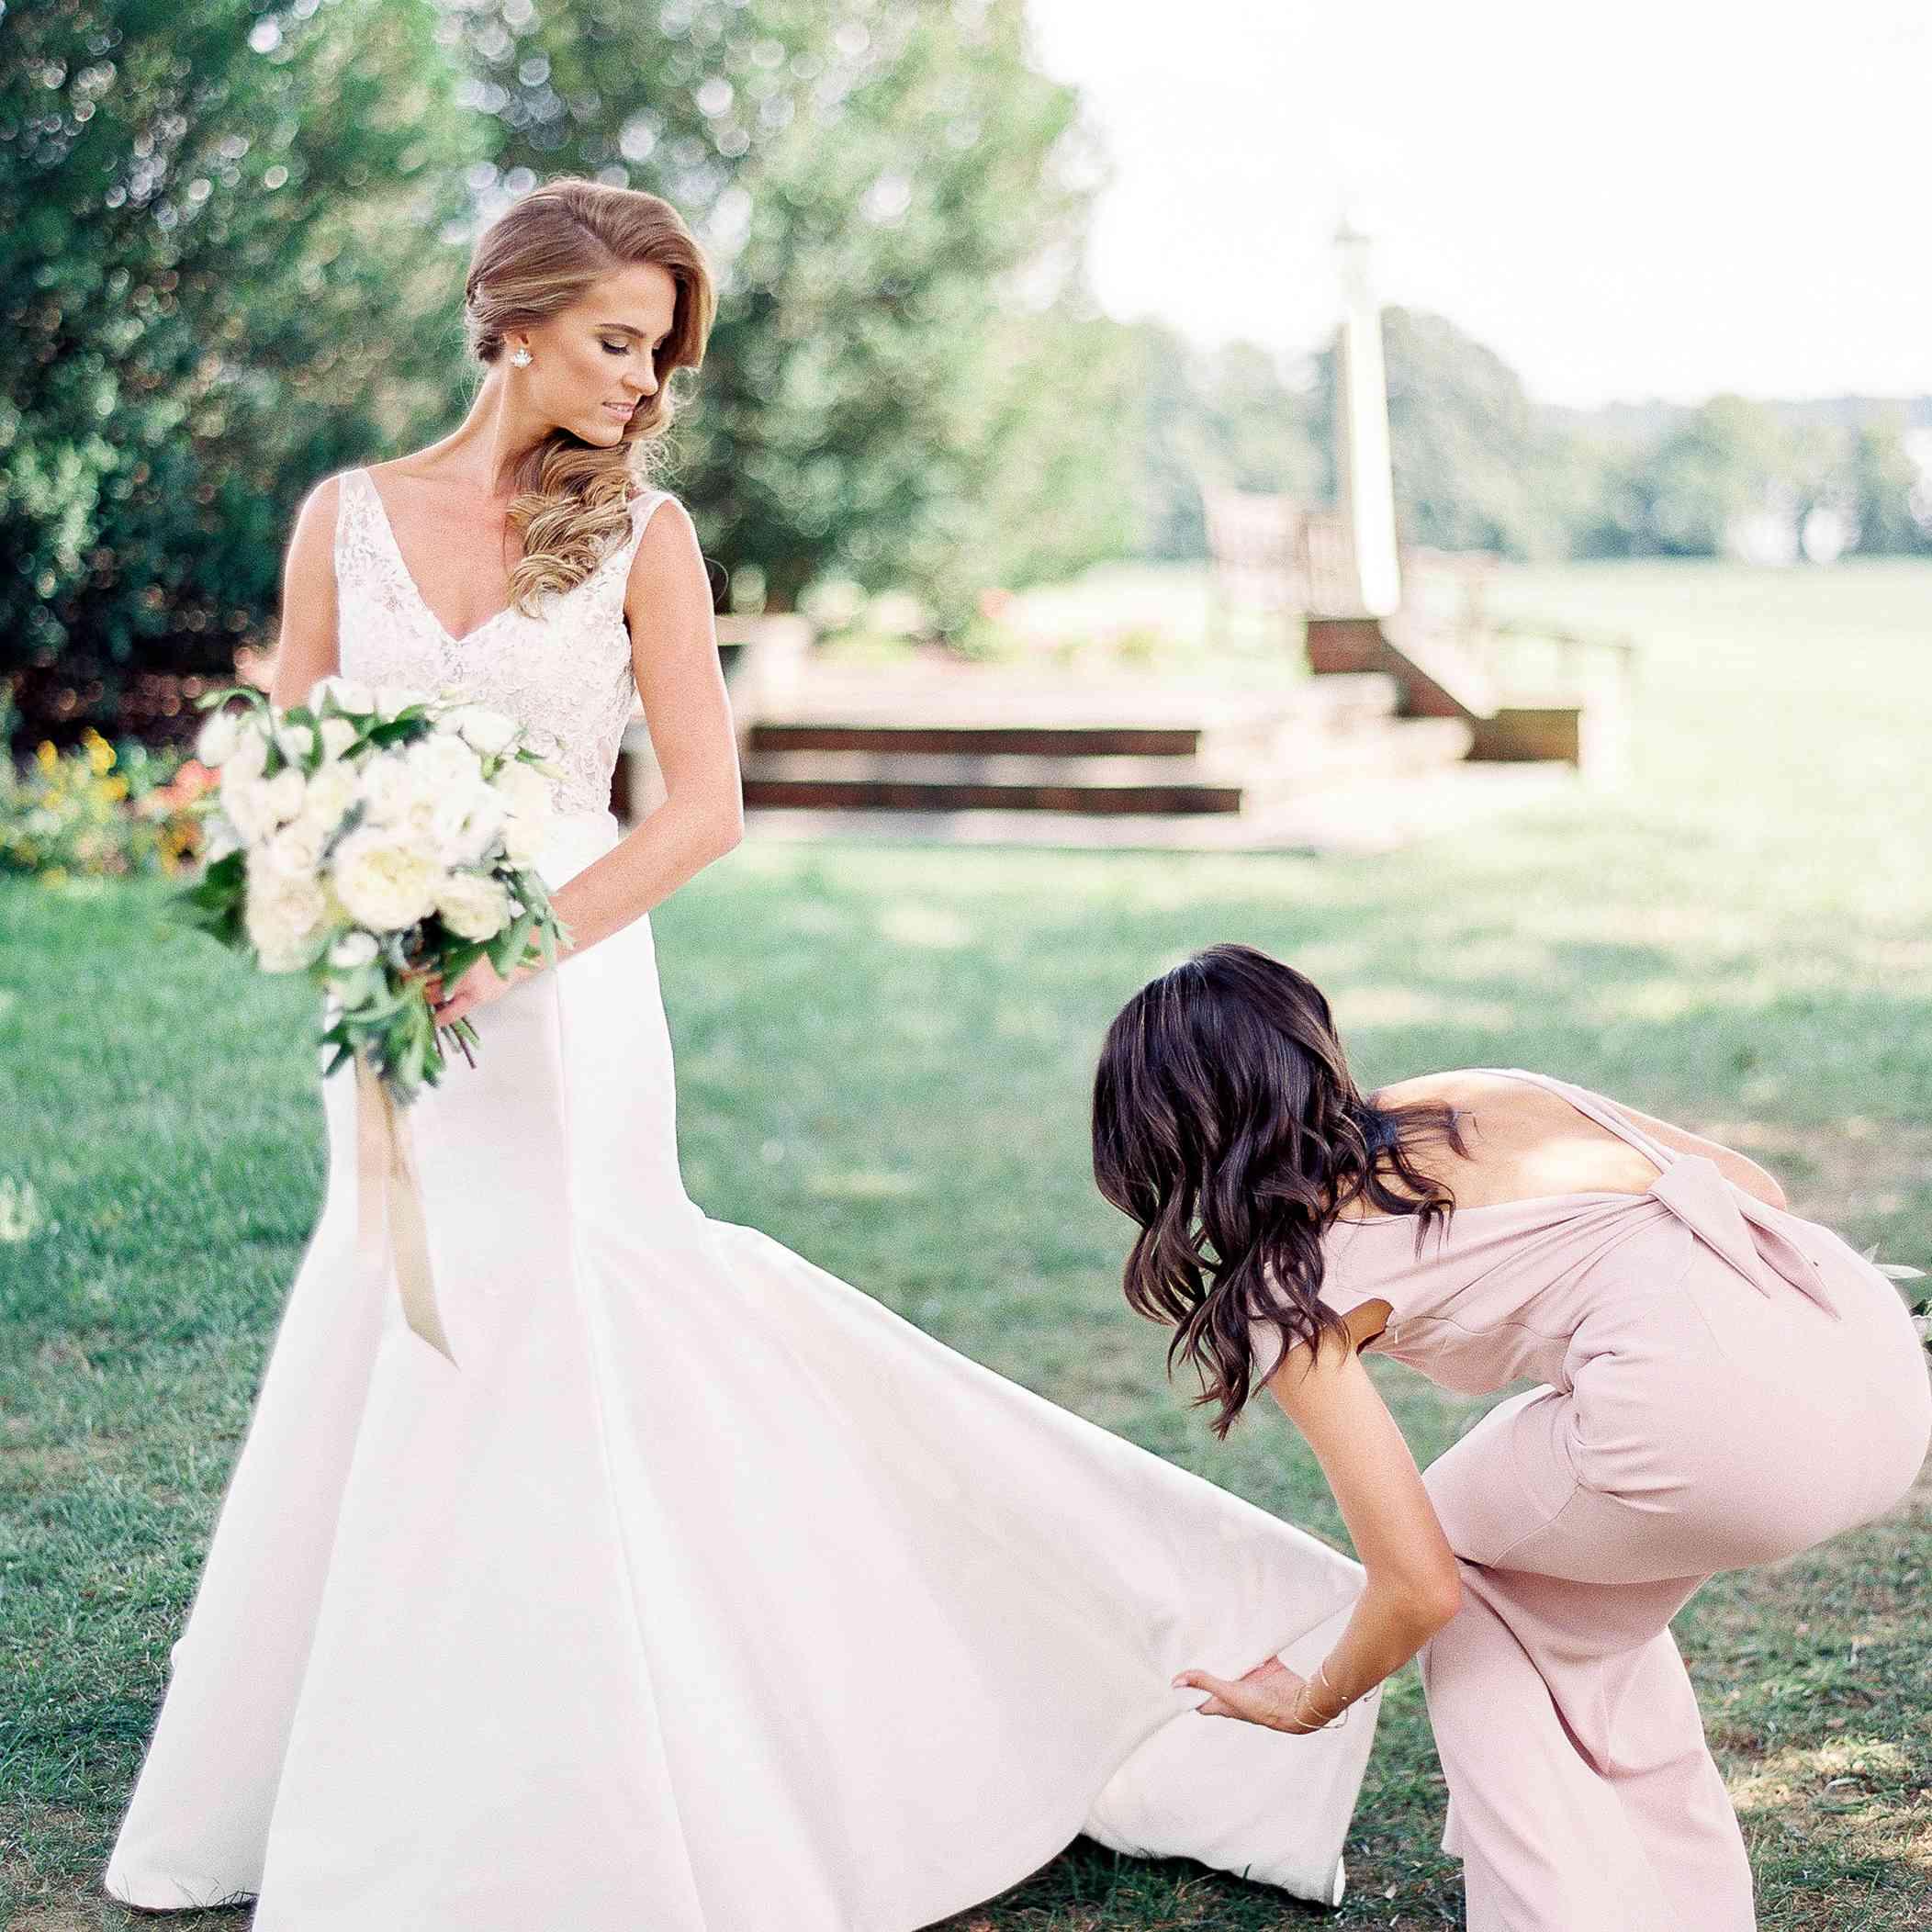 <p>bridesmaid helping bride get dressed</p>